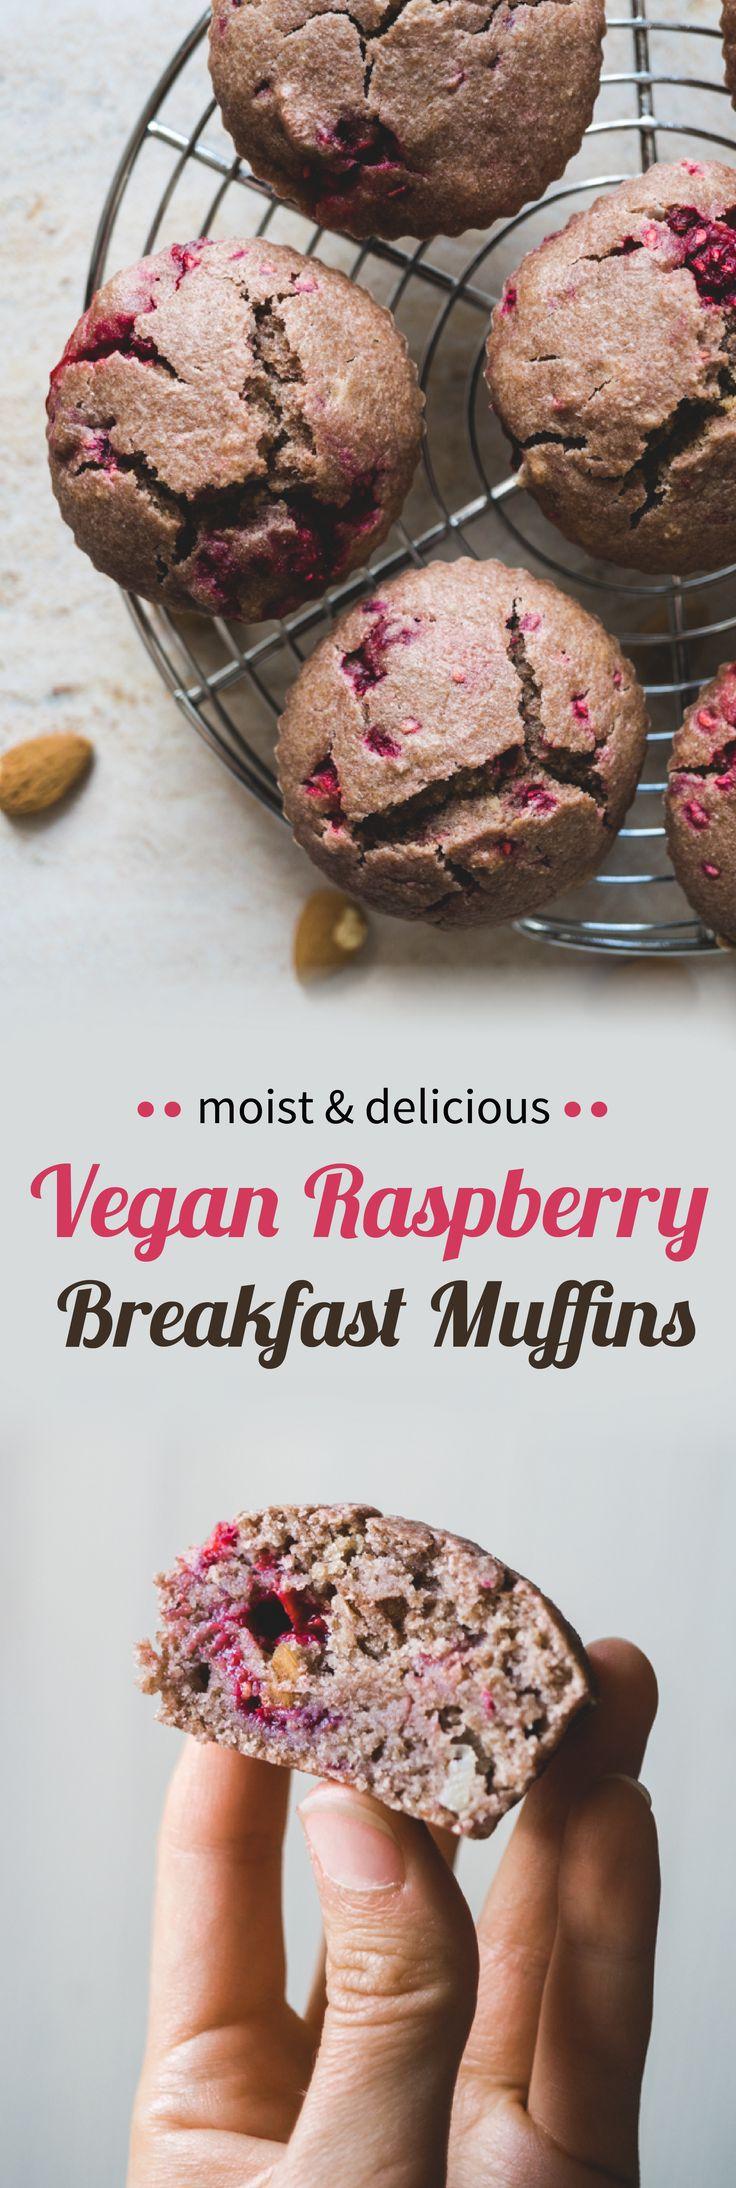 Moist And Delicious Vegan Raspberry Breakfast Muffins